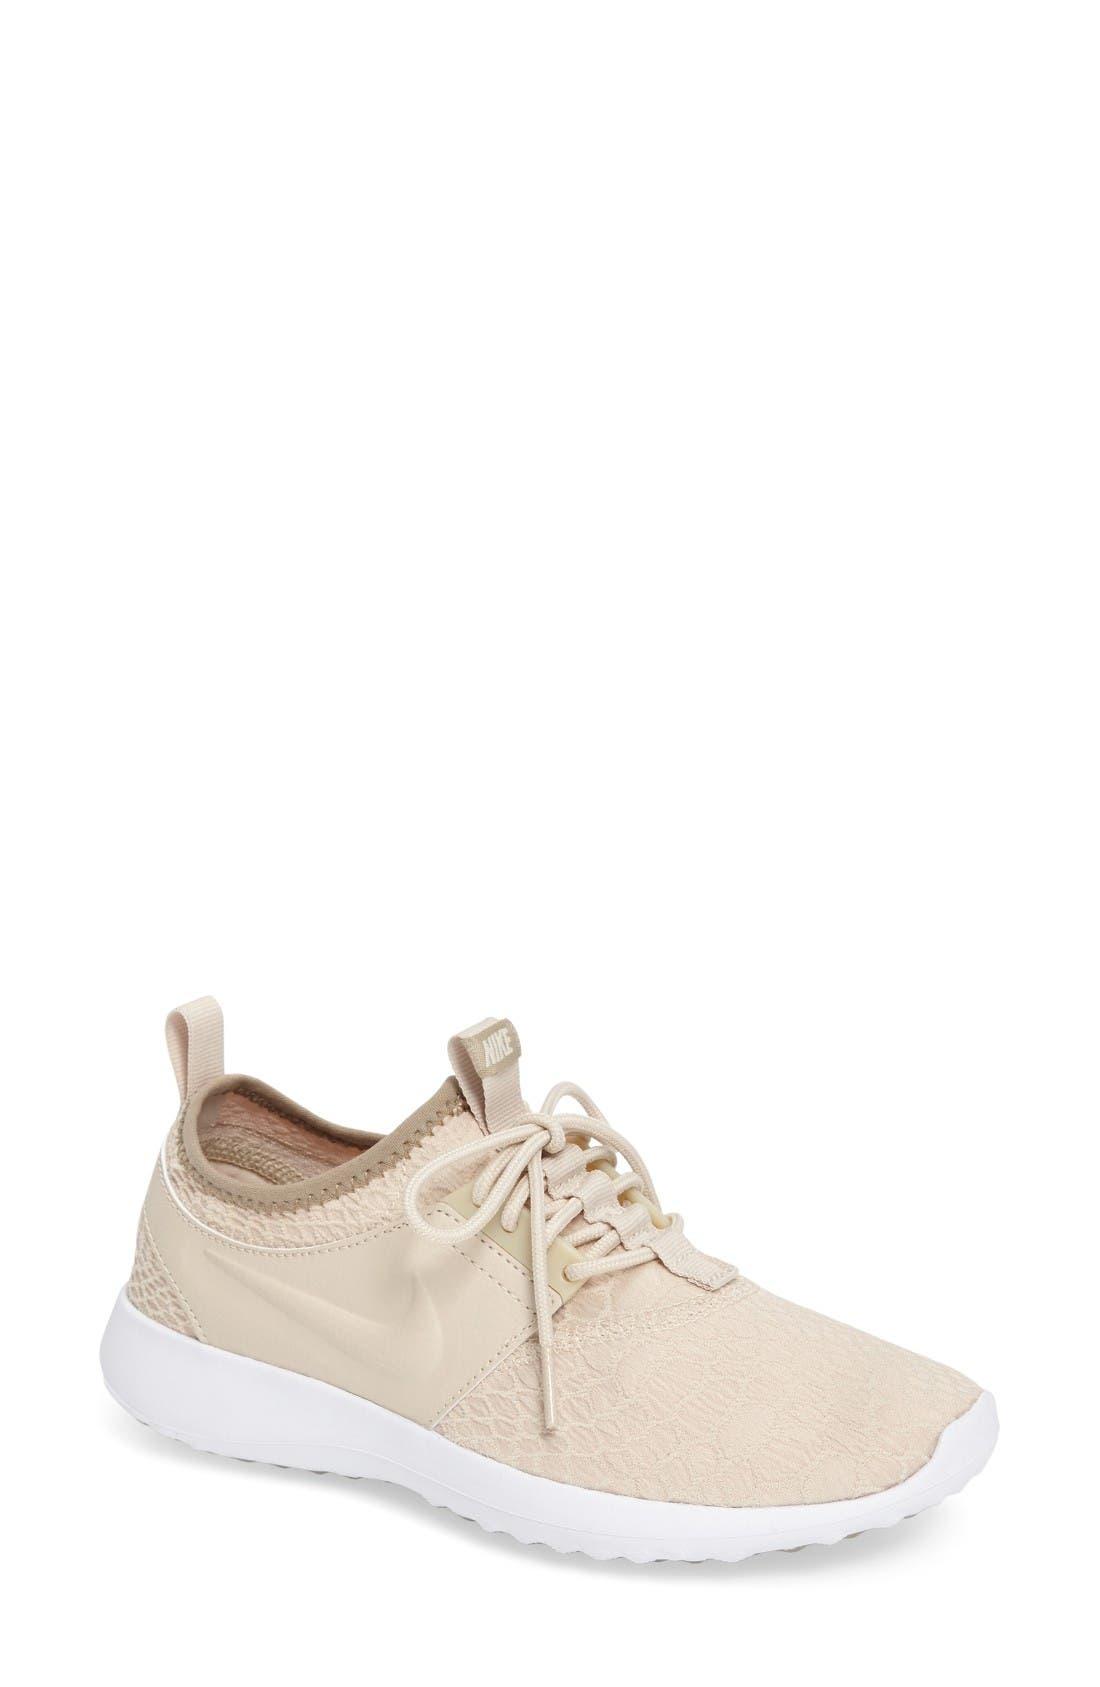 Alternate Image 1 Selected - Nike Juvenate SE Sneaker